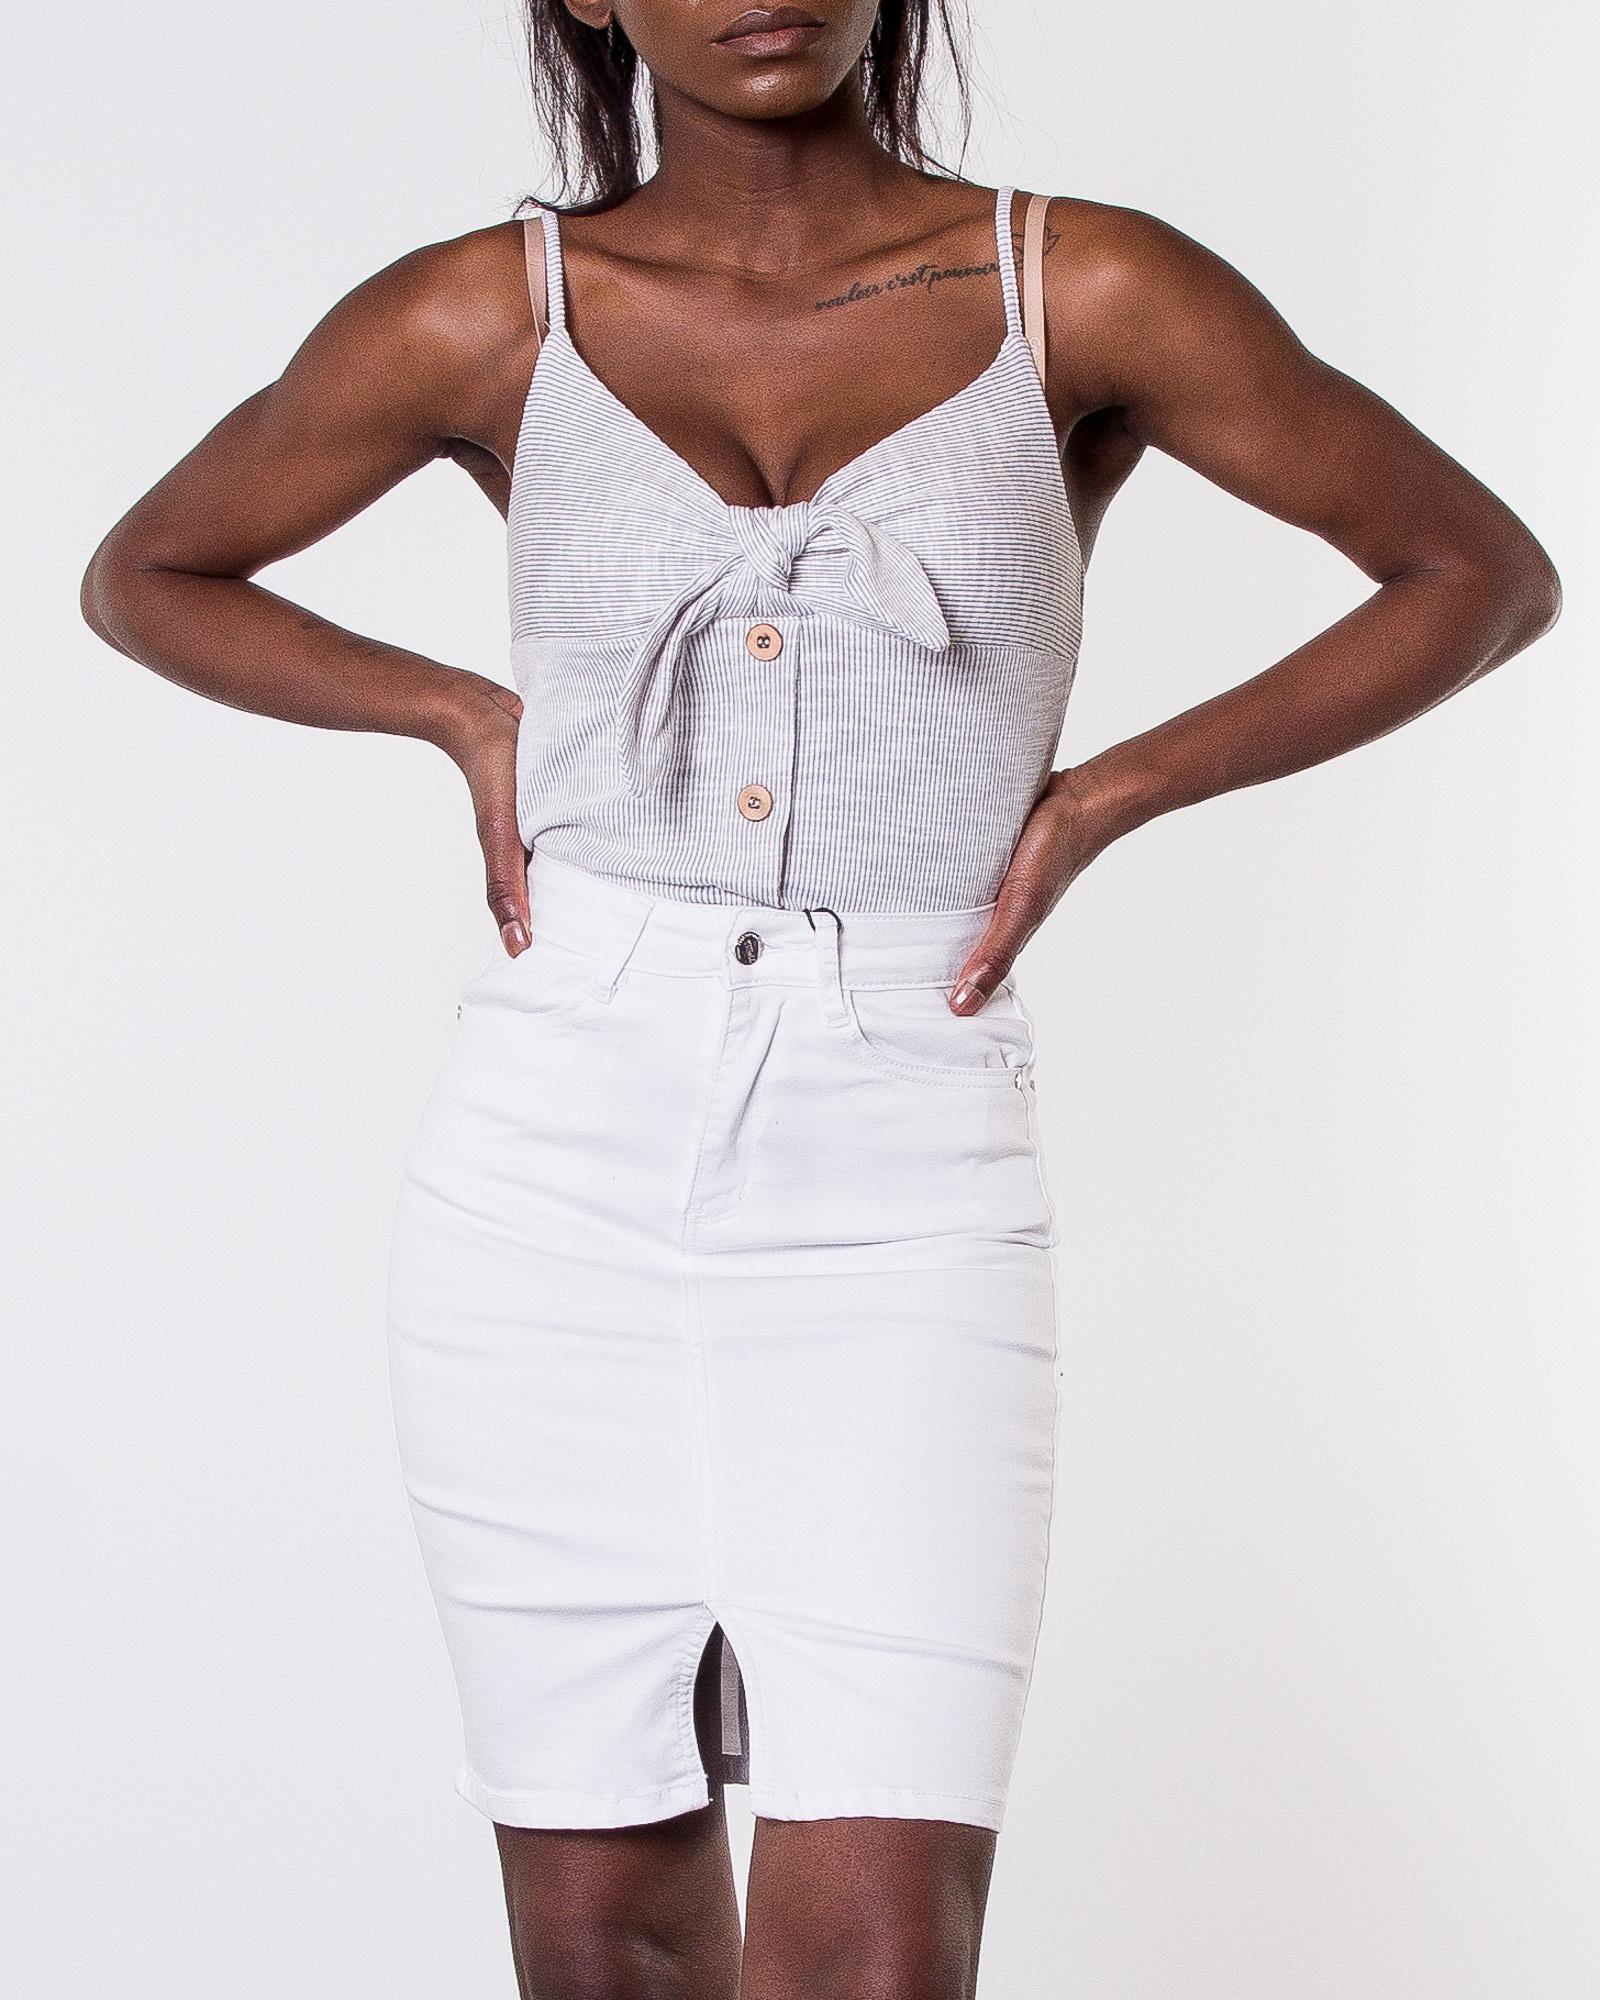 73e42f48d9b 77th Flea, Bianca Superstretch Skirt White | Women's Skirts ...